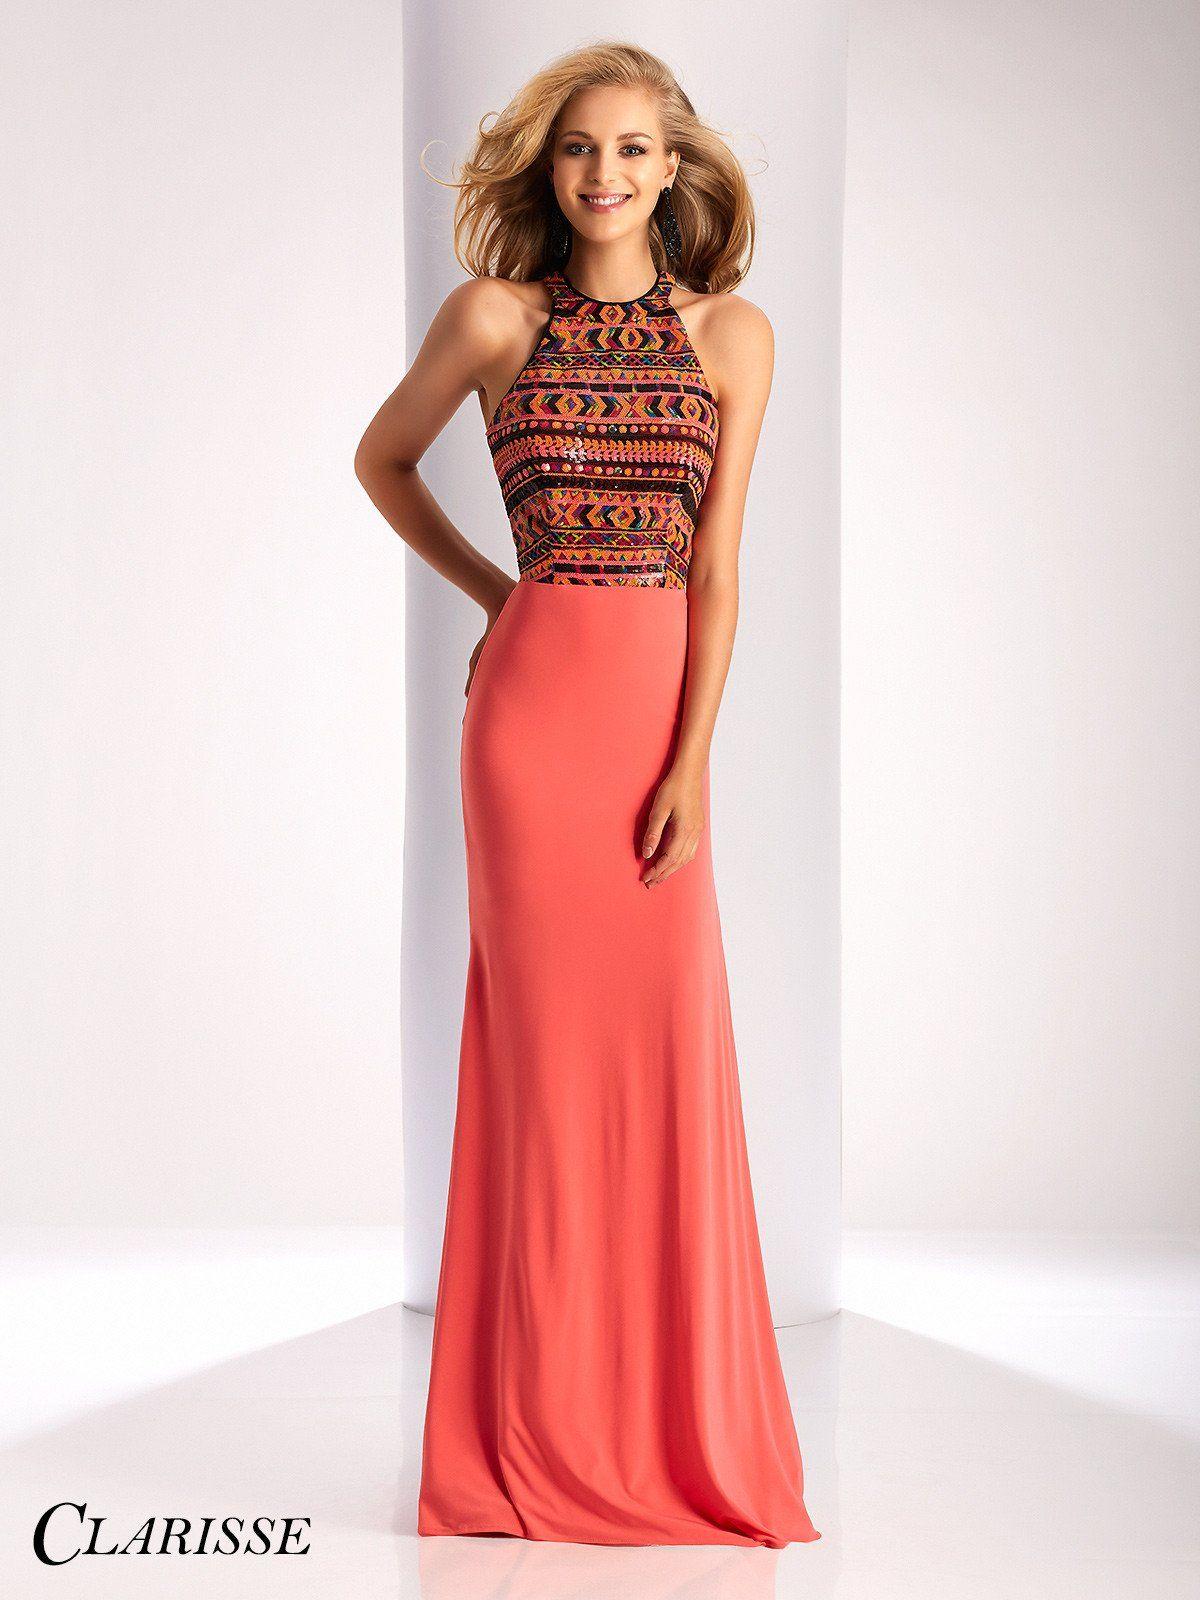 Clarisse prom coralmulti high neckline prom dress pinterest